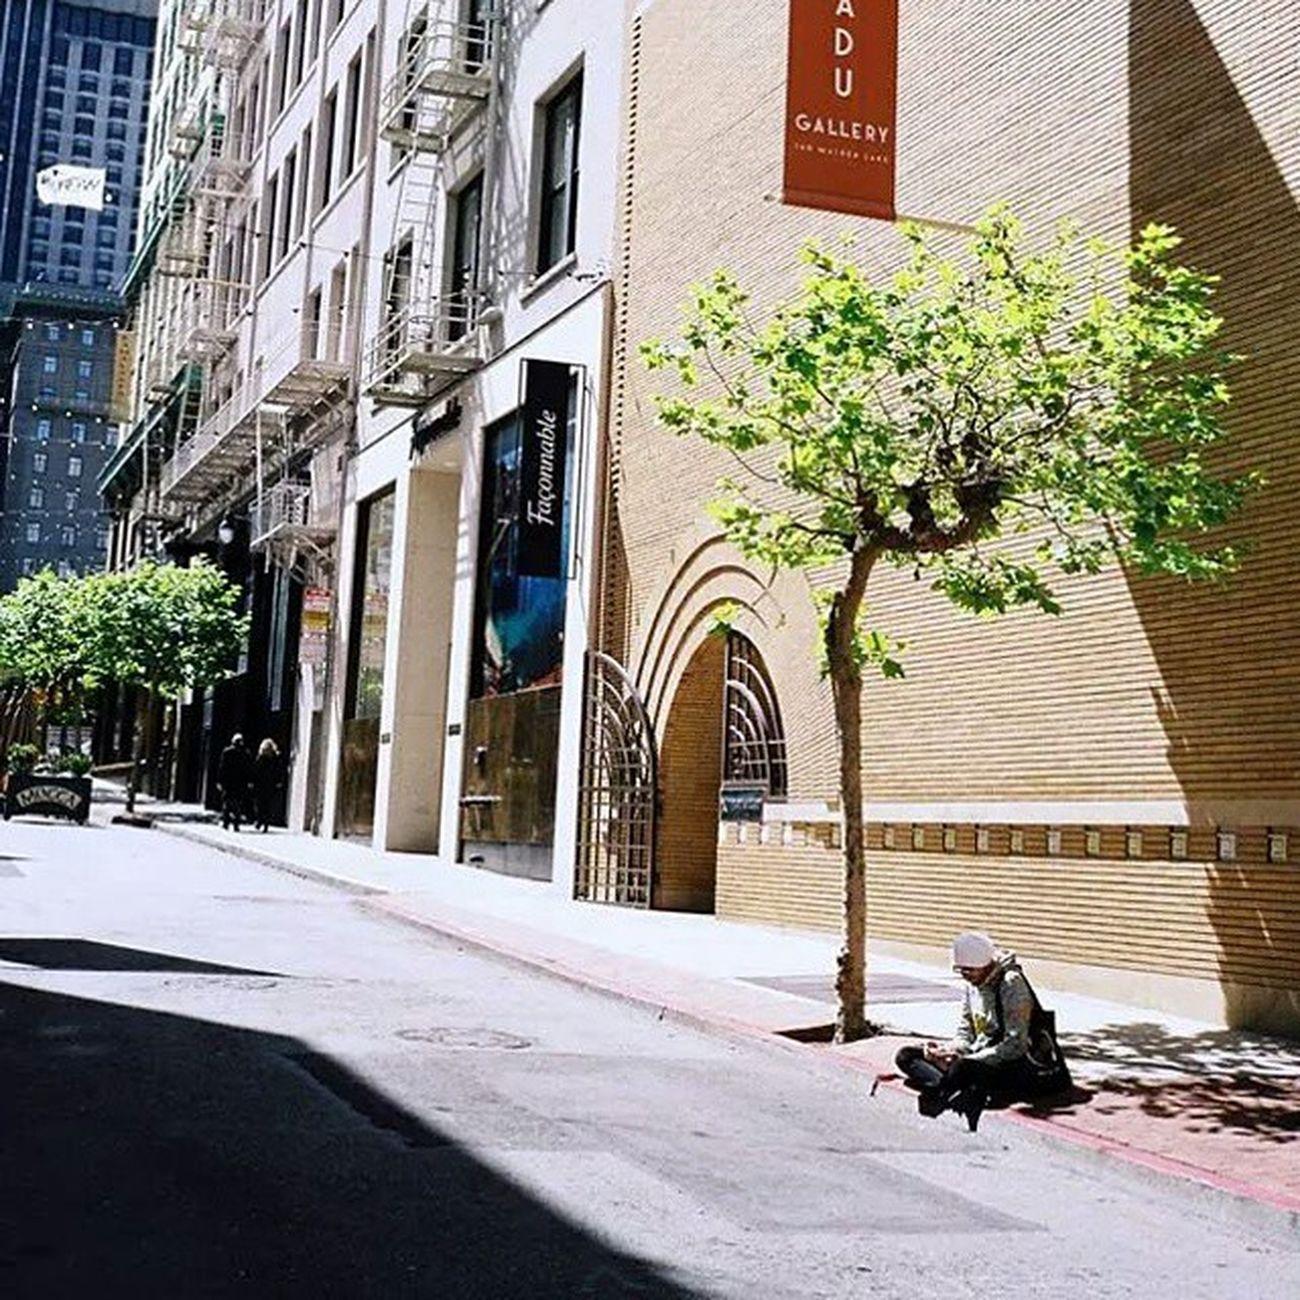 Vscocam Sanfranciso Cymera USA People Unionsquare Cymeraapp VSCO Contax Contaxt3